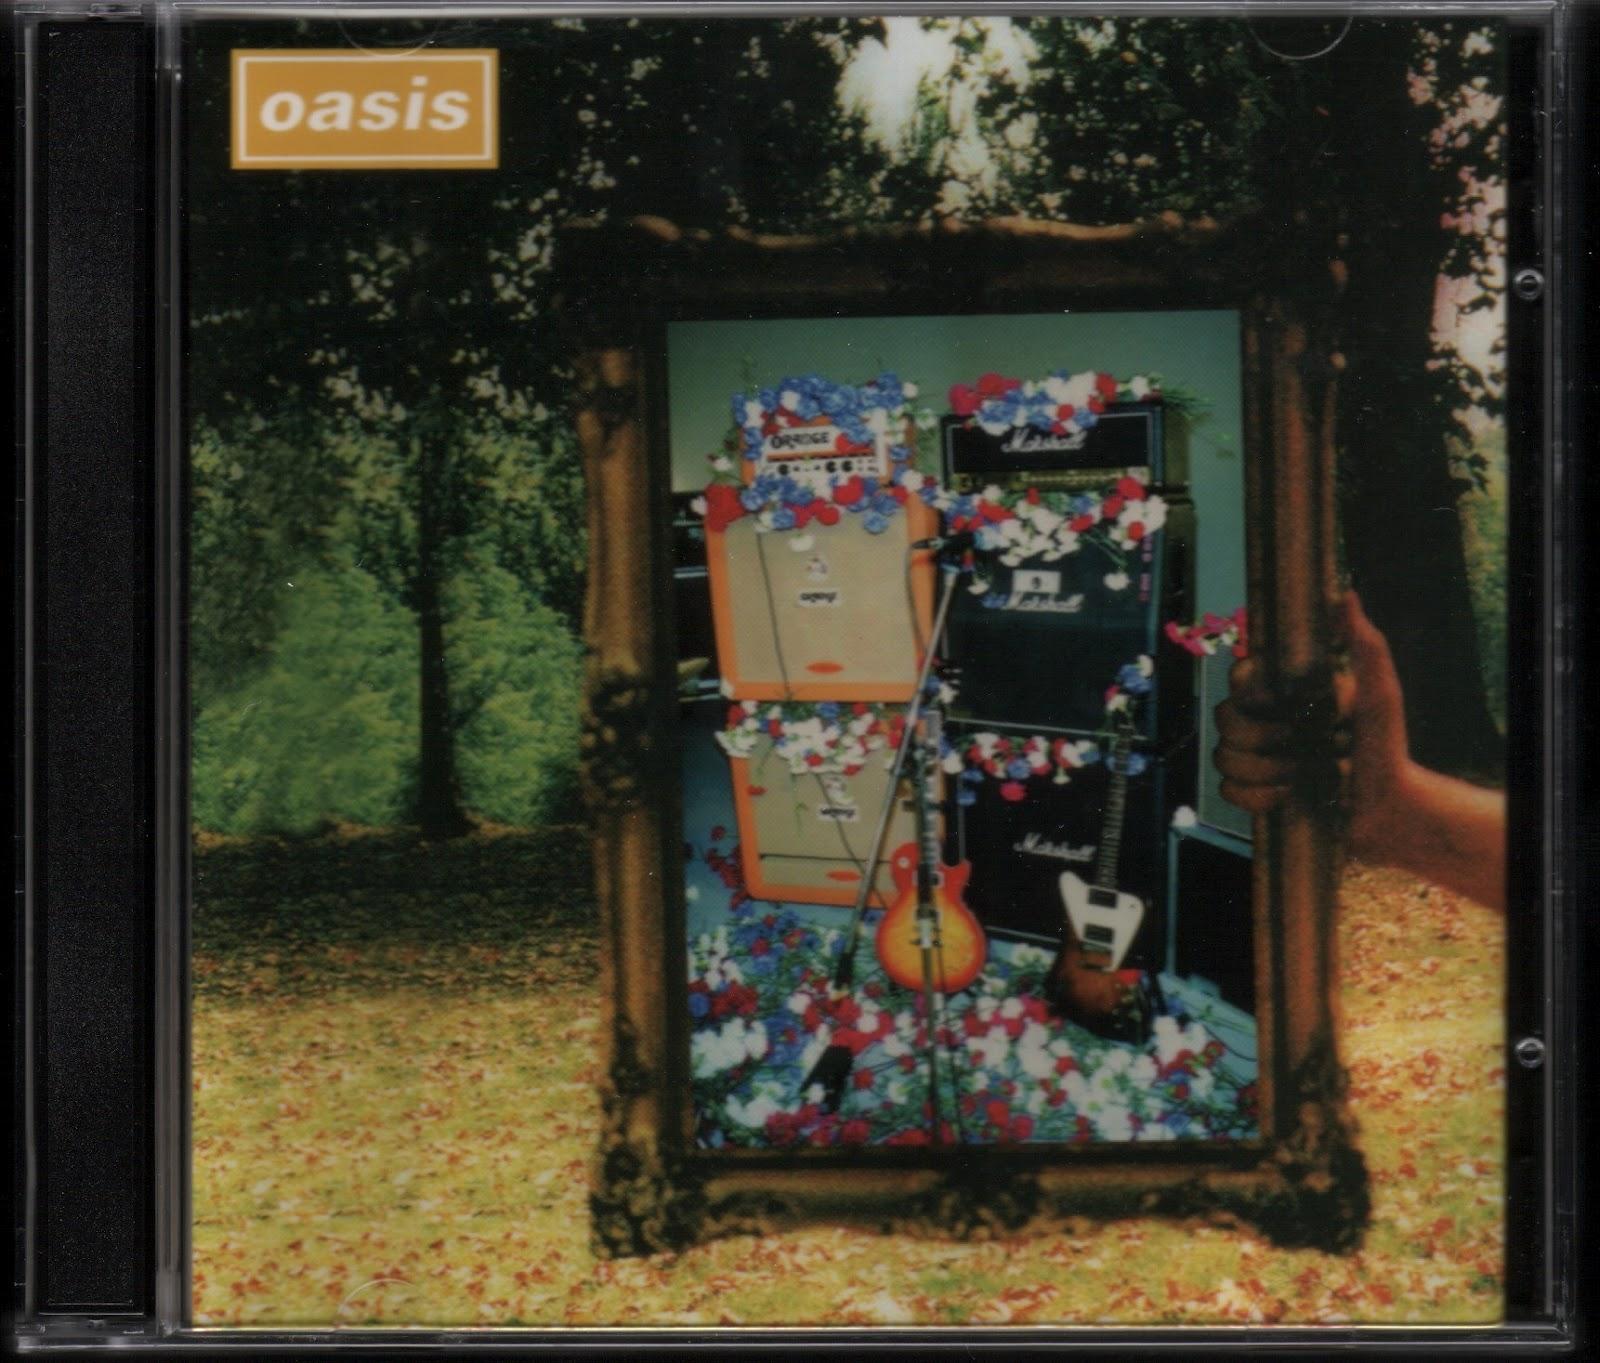 Oasis Bootlegs From Fuckuoka: Master Multitracks